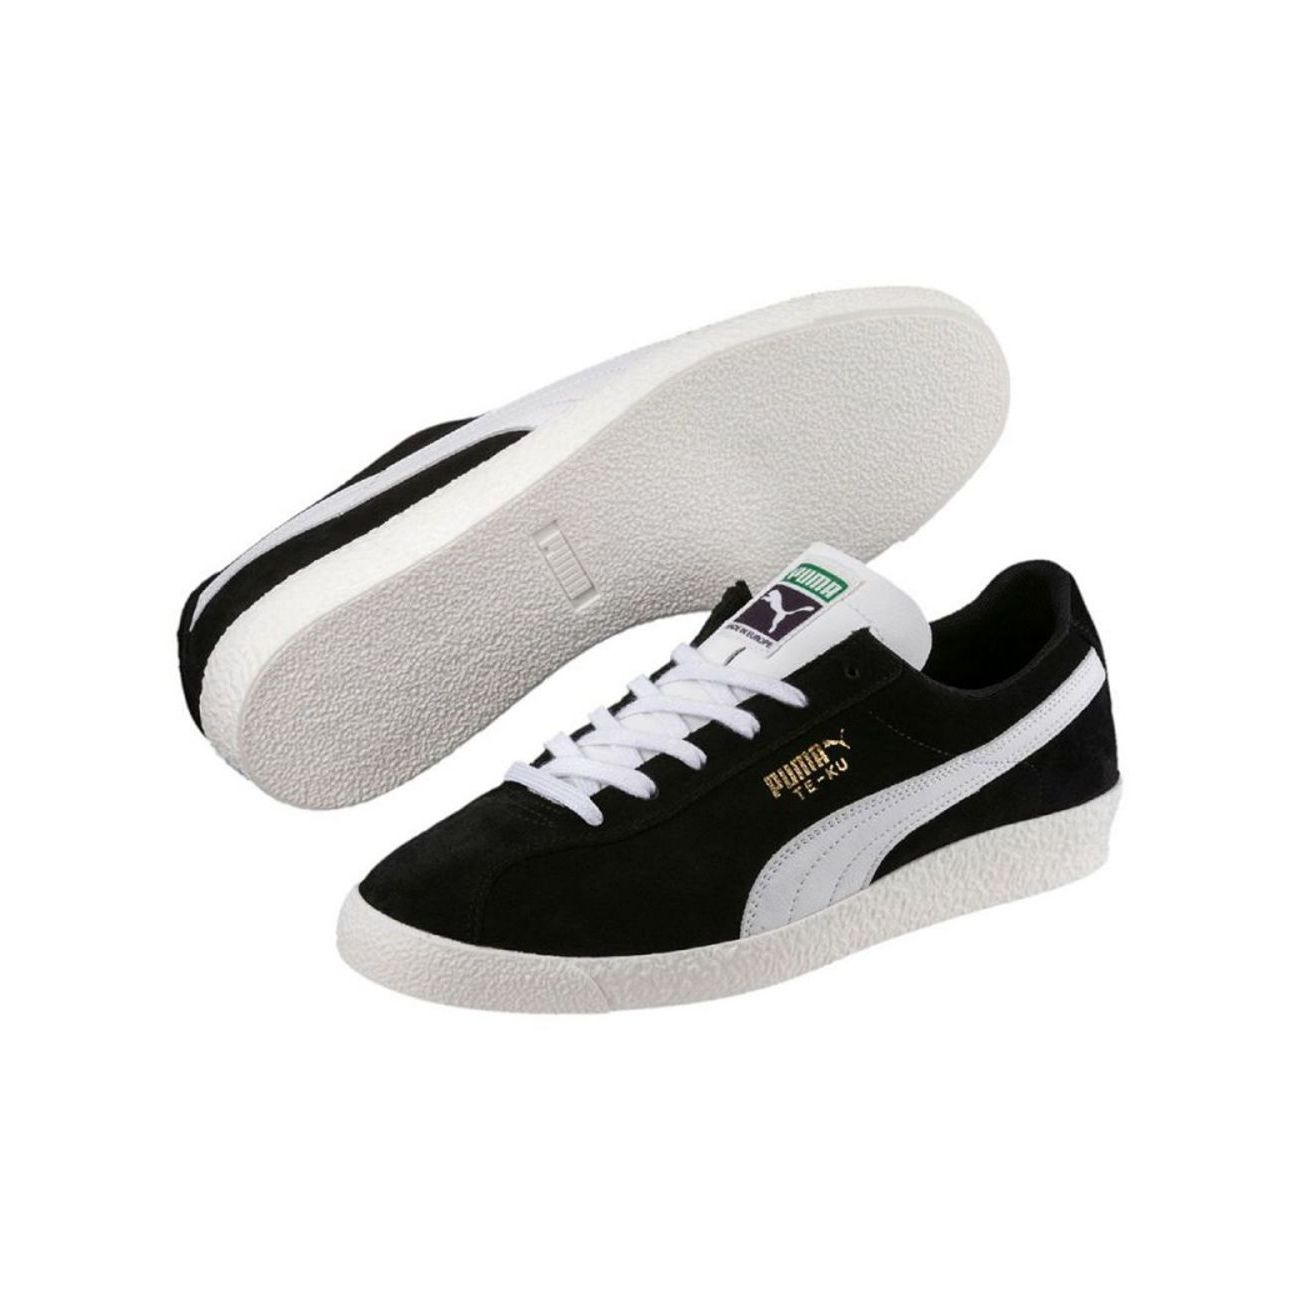 Mode Lifestyle homme PUMA Chaussures TE KU